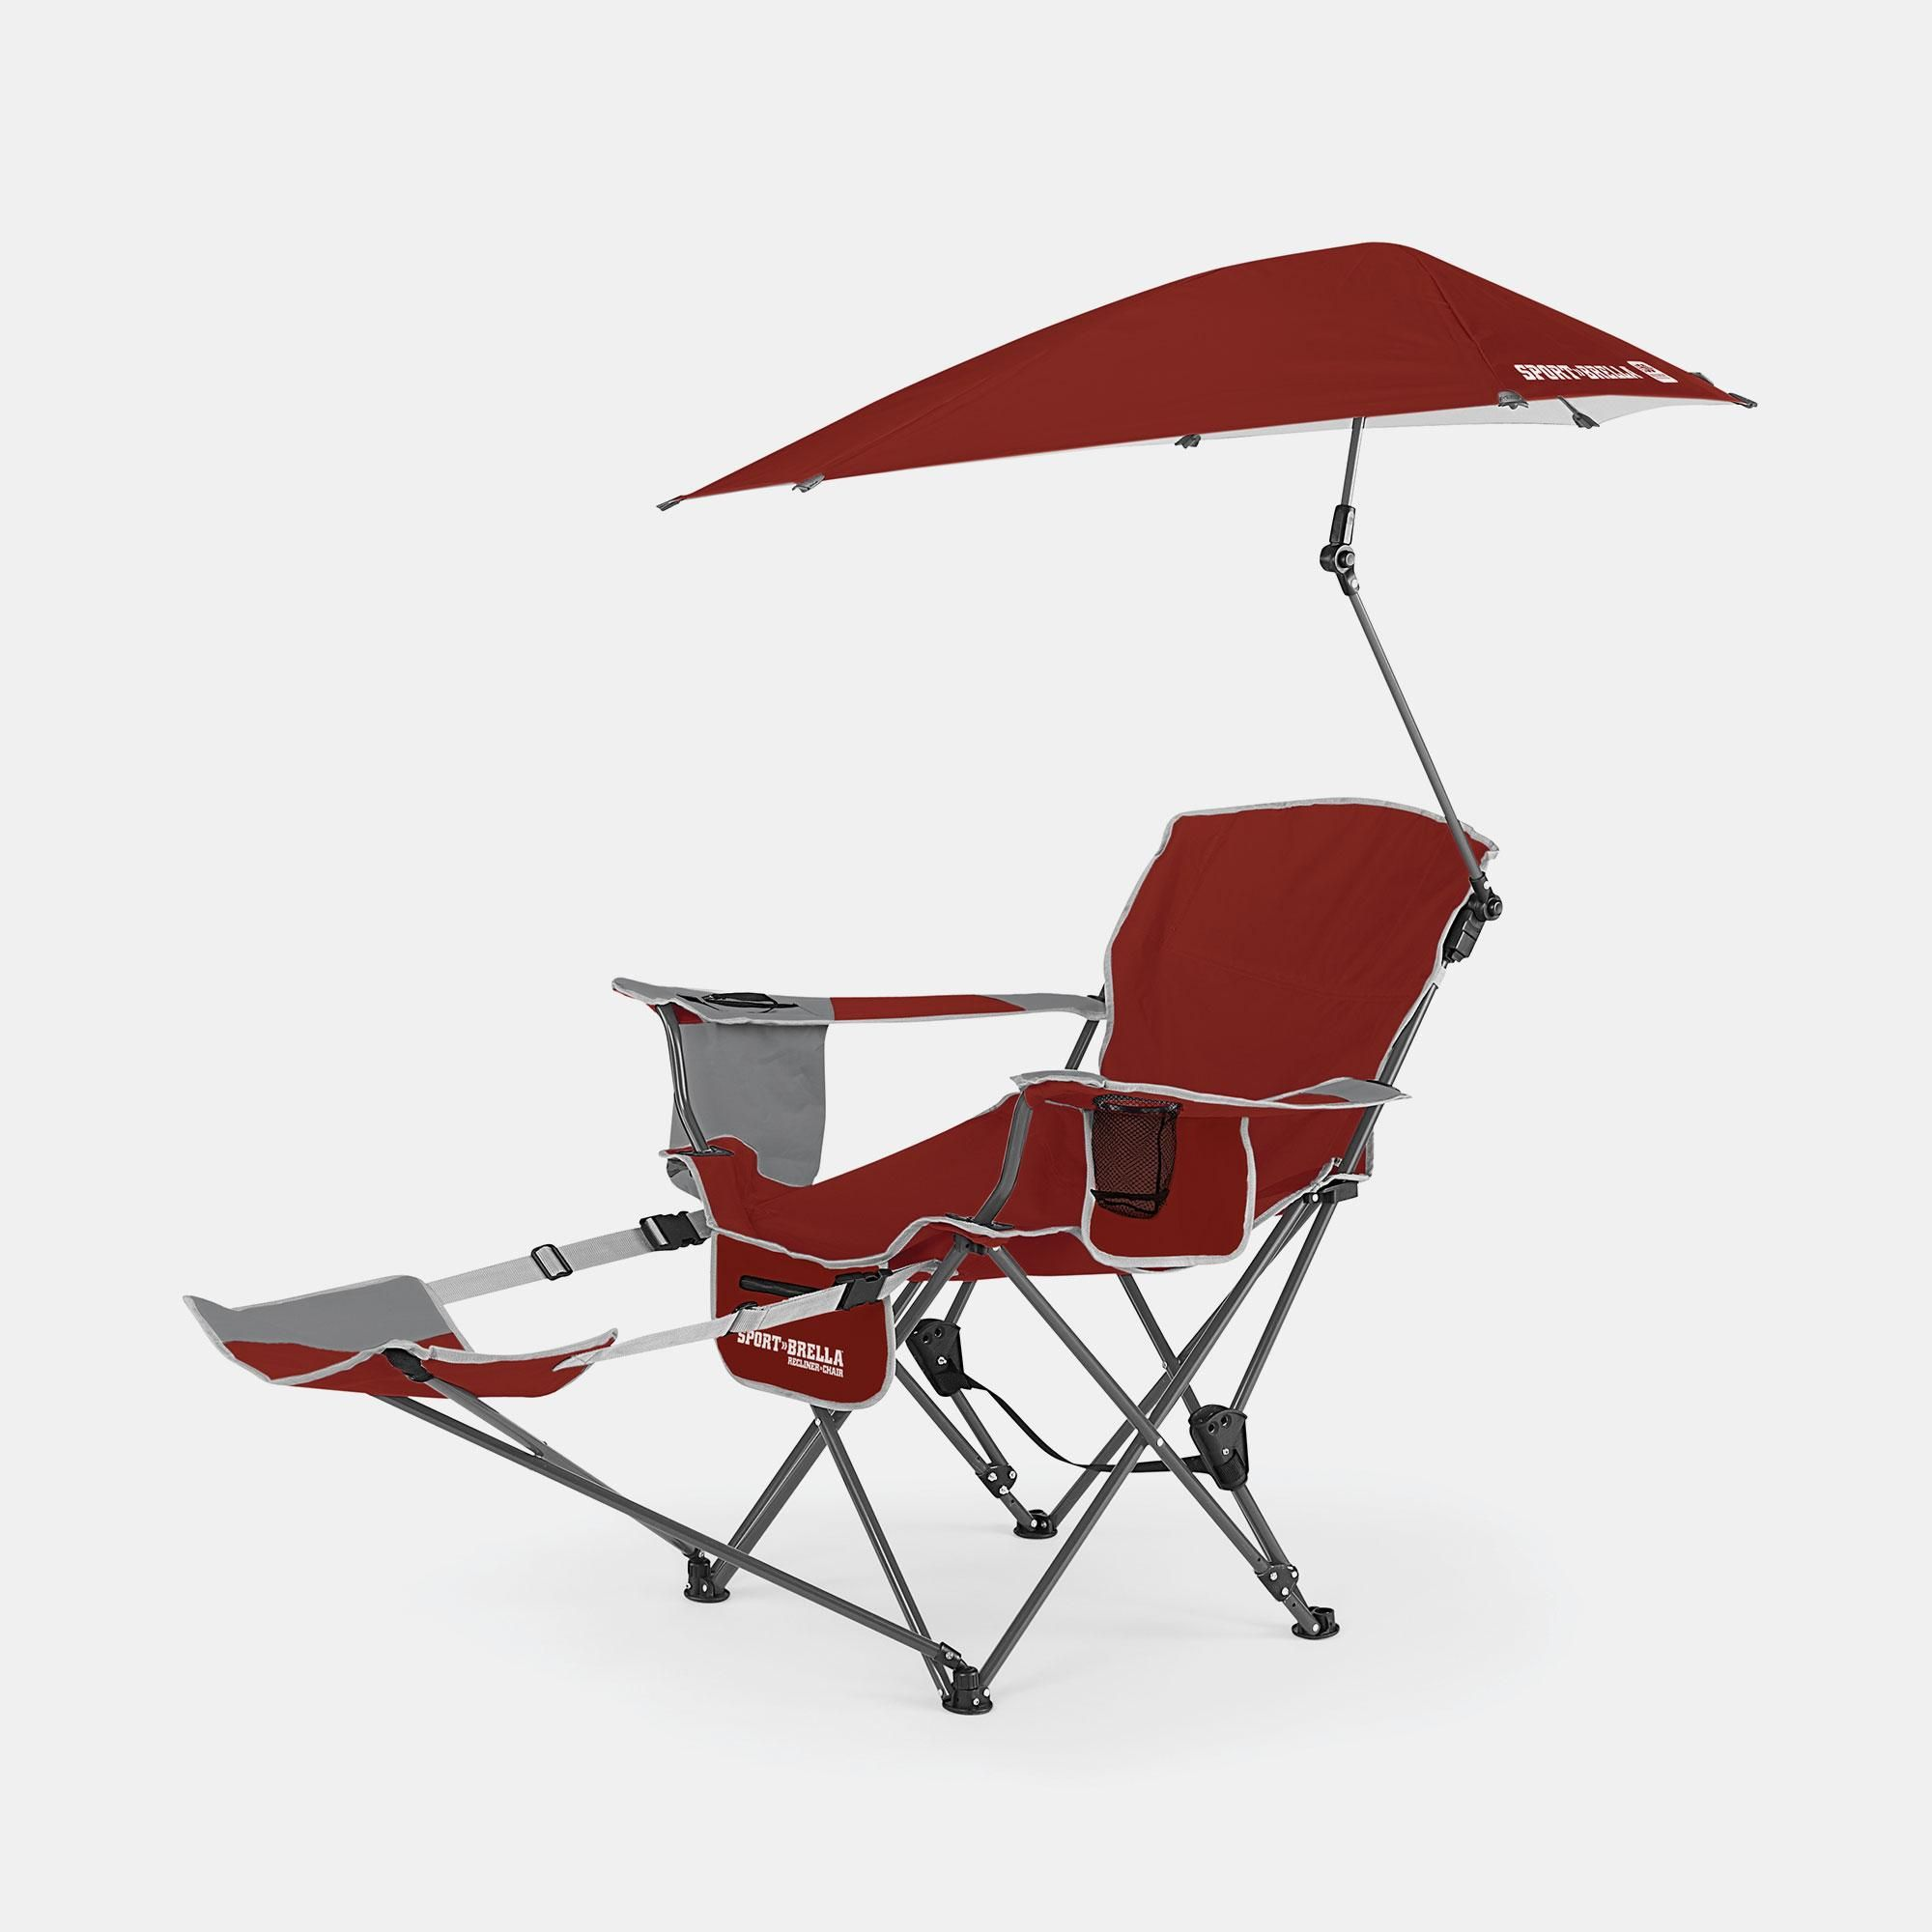 SportBrella Recliner Chair 3Position